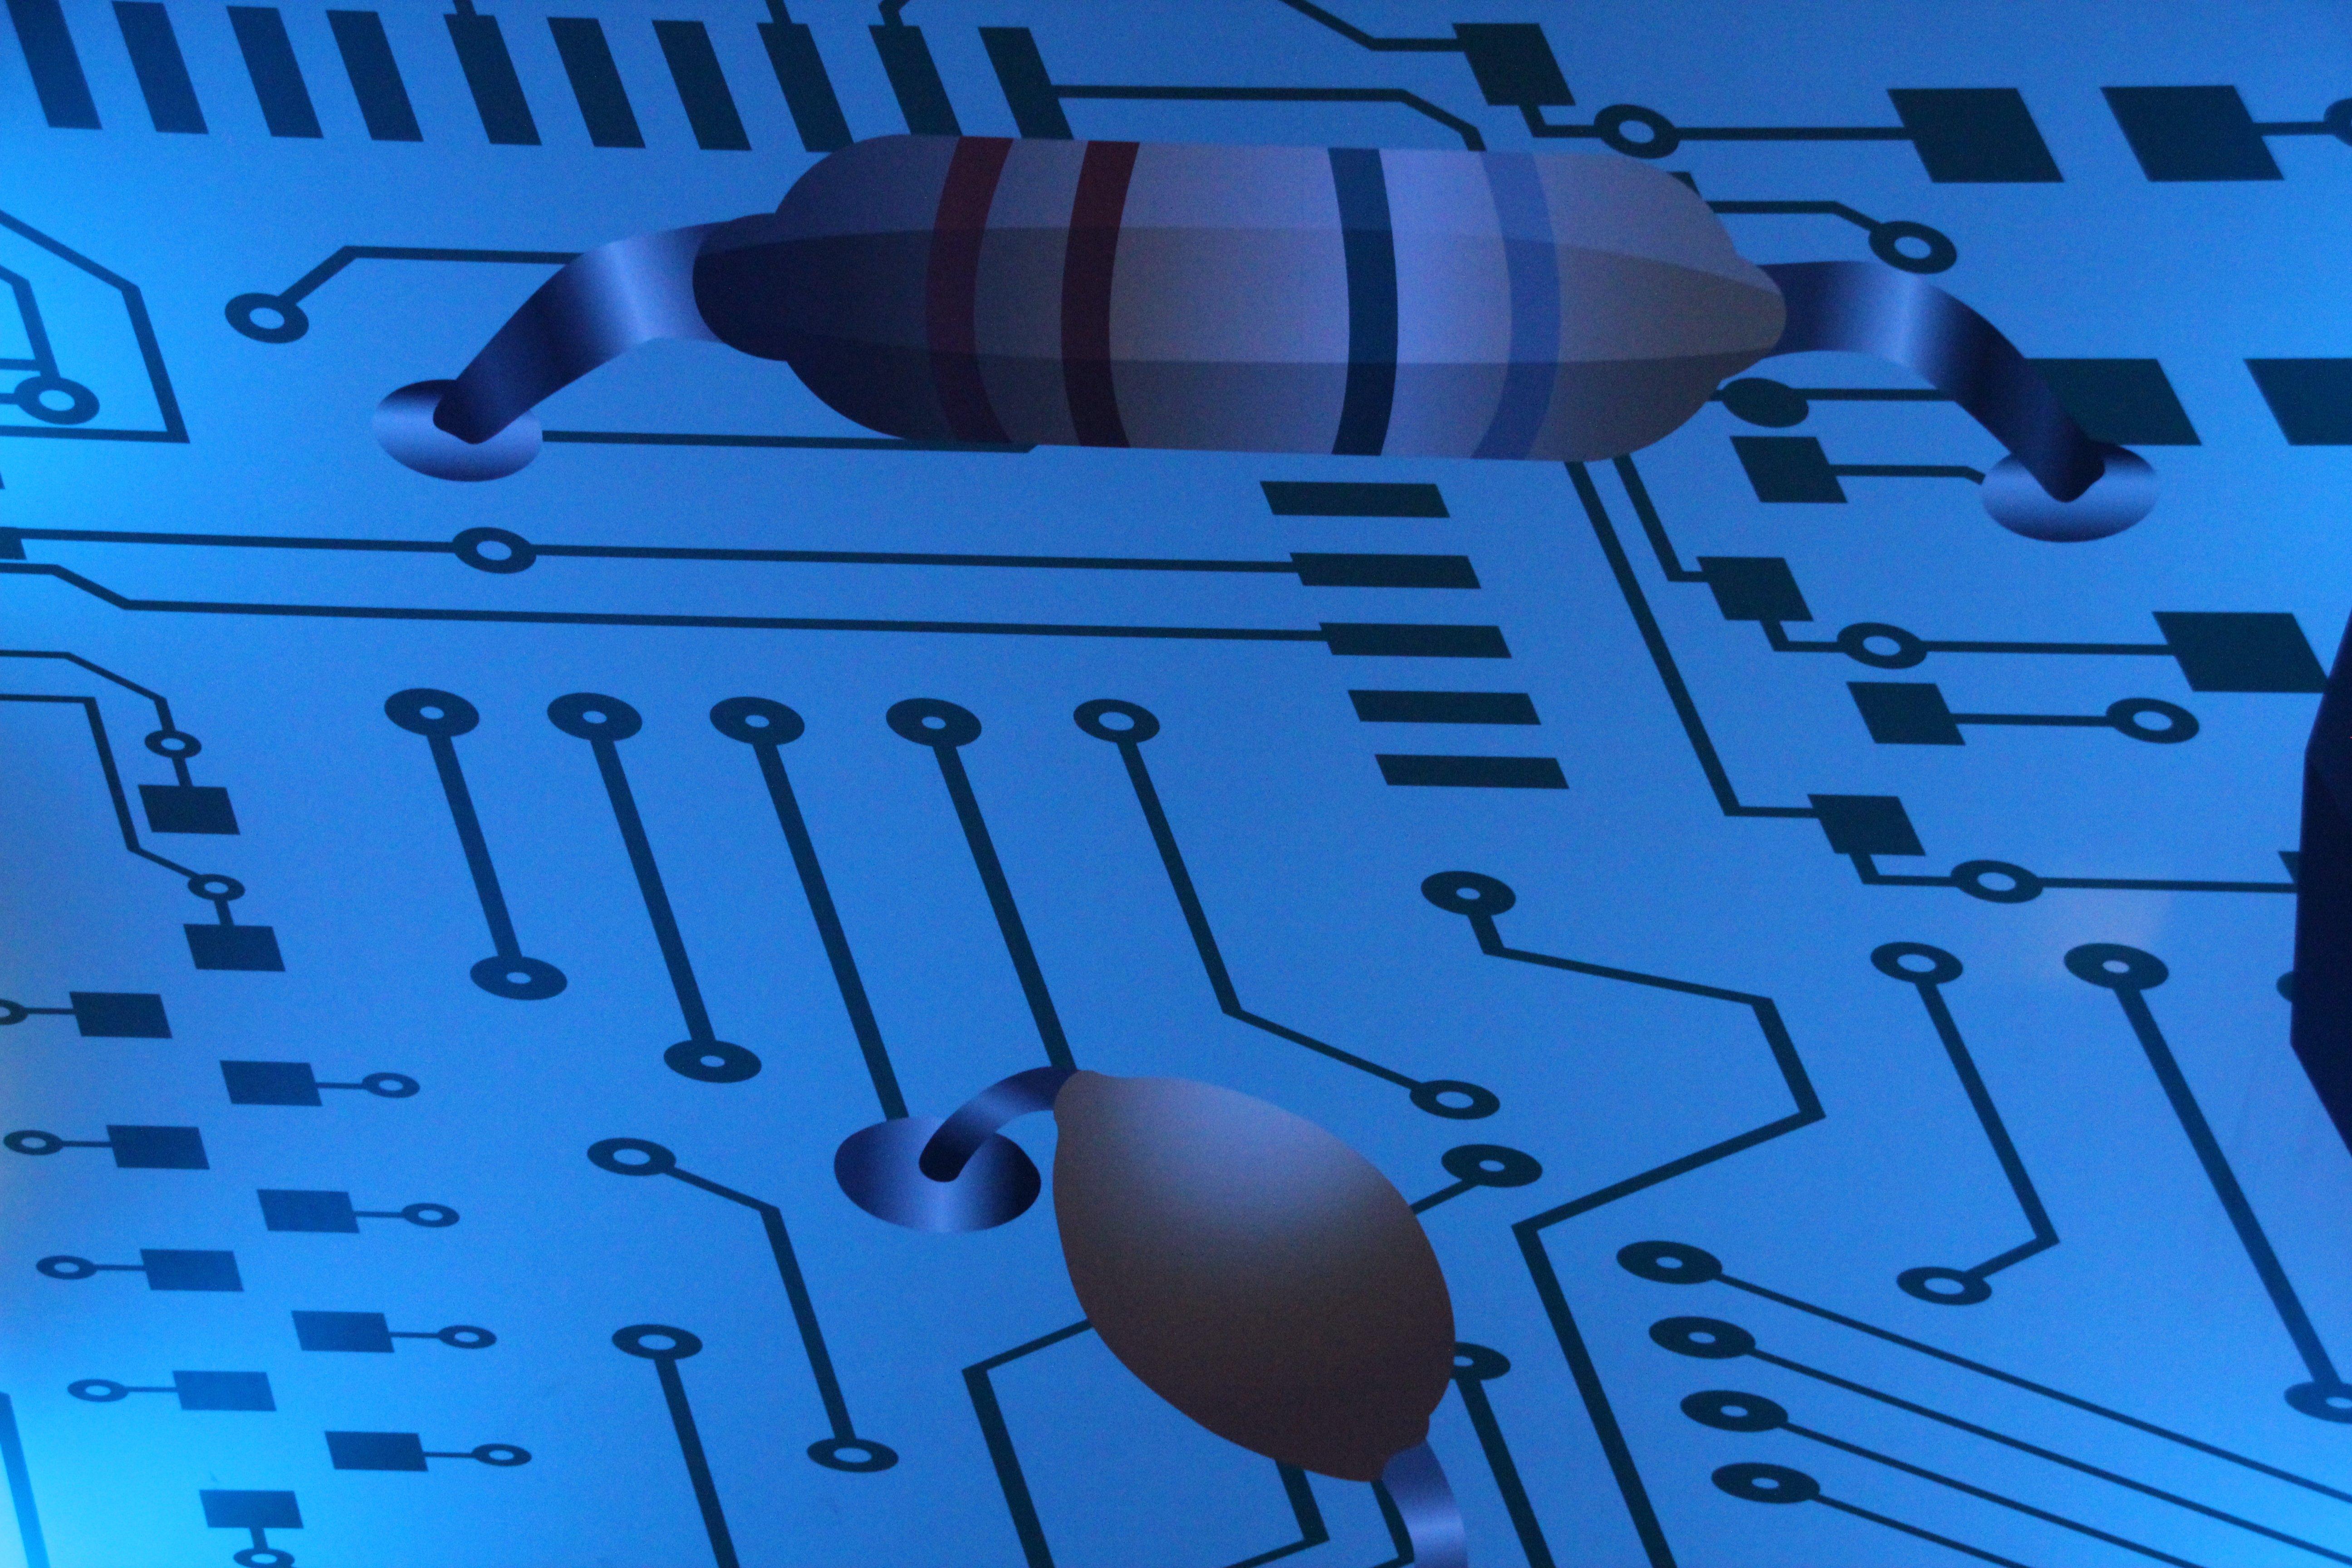 Free Images Board Number Line Vehicle Electricity Font Transistor Wire Diagram Electronics Illustration Elektrik Screenshot Blue Light Conductors Atmosphere Of